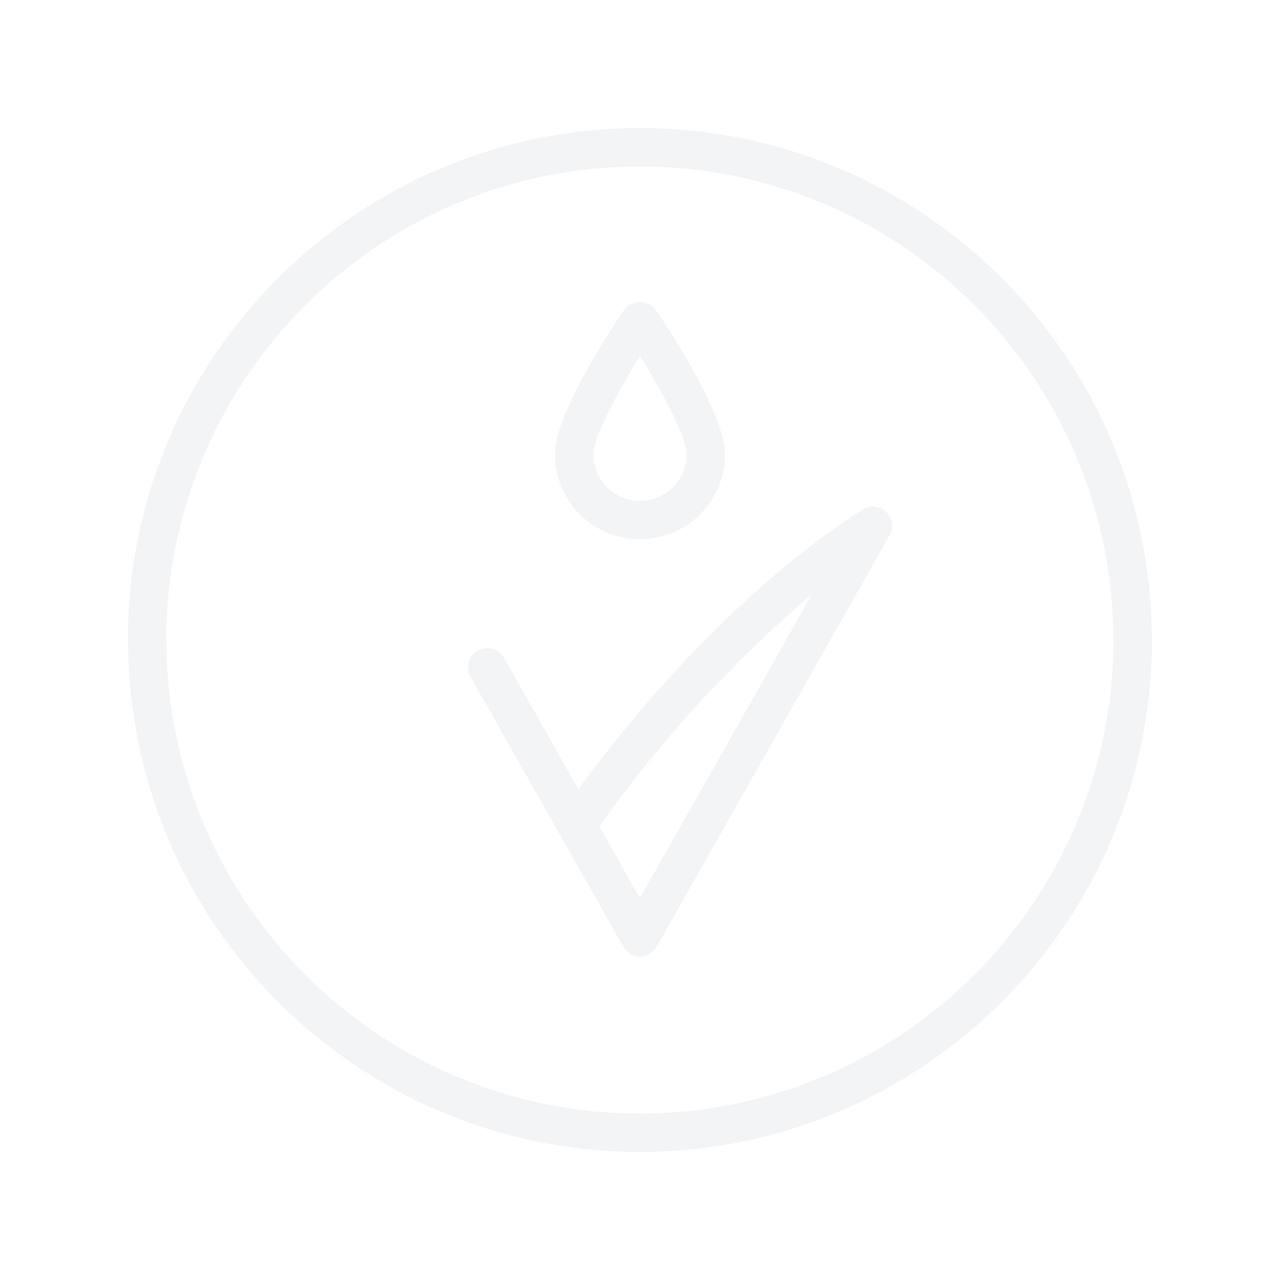 HOLIKA HOLIKA Smooth Egg Skin Cleansing пенка для умывания 140ml